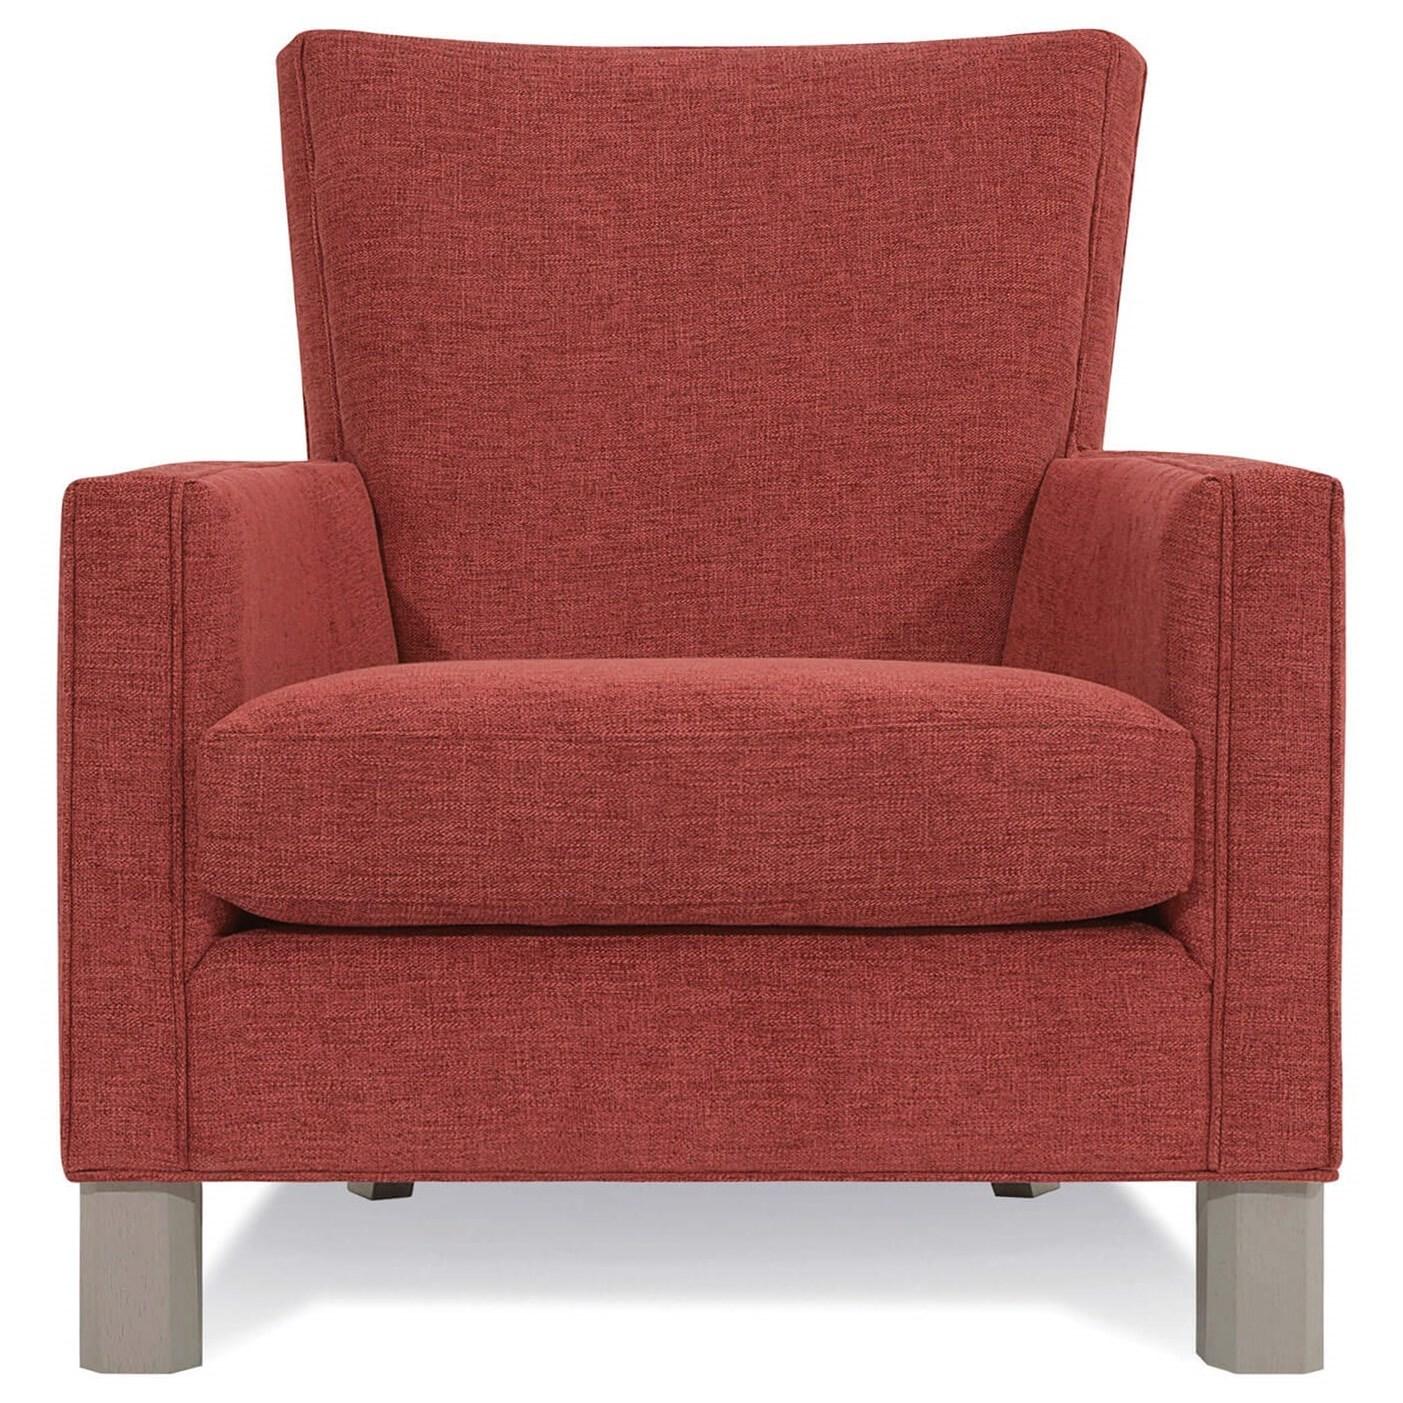 Pier Accent Chair by Palliser at Stoney Creek Furniture